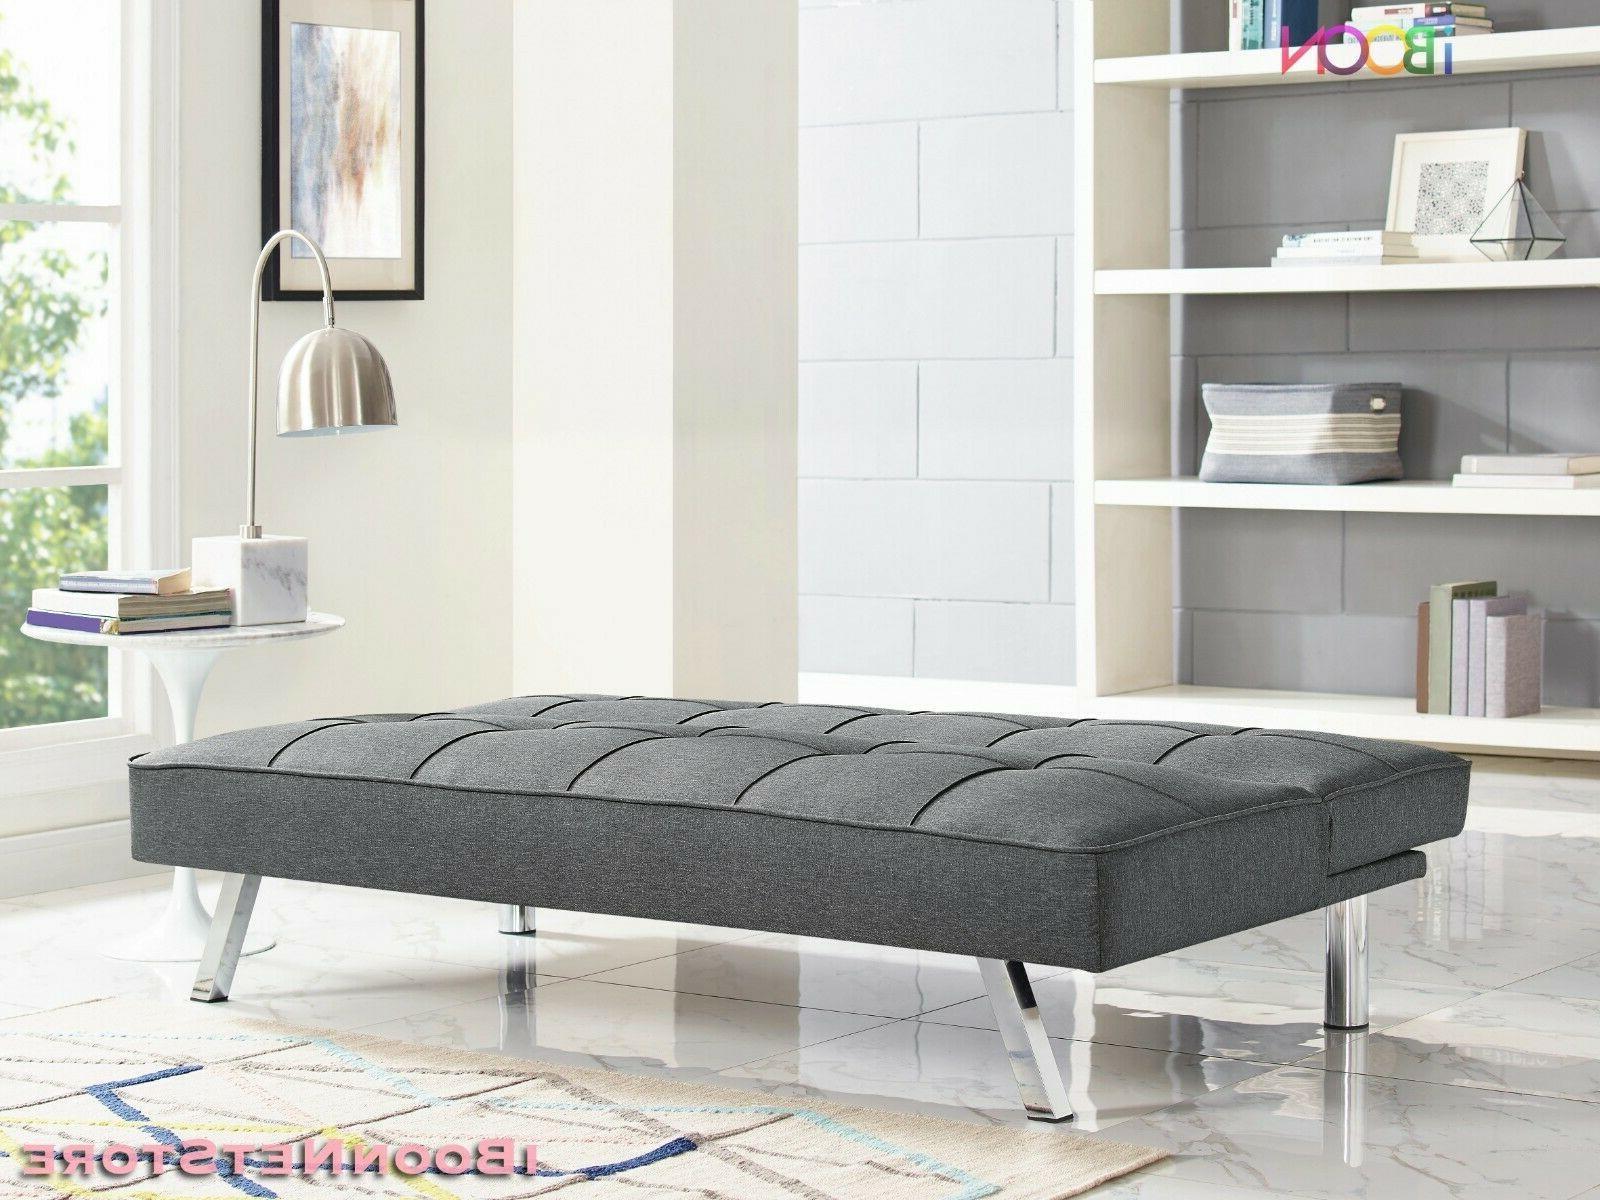 Futon Sofa Bed Convertible Foldable Full Mattress